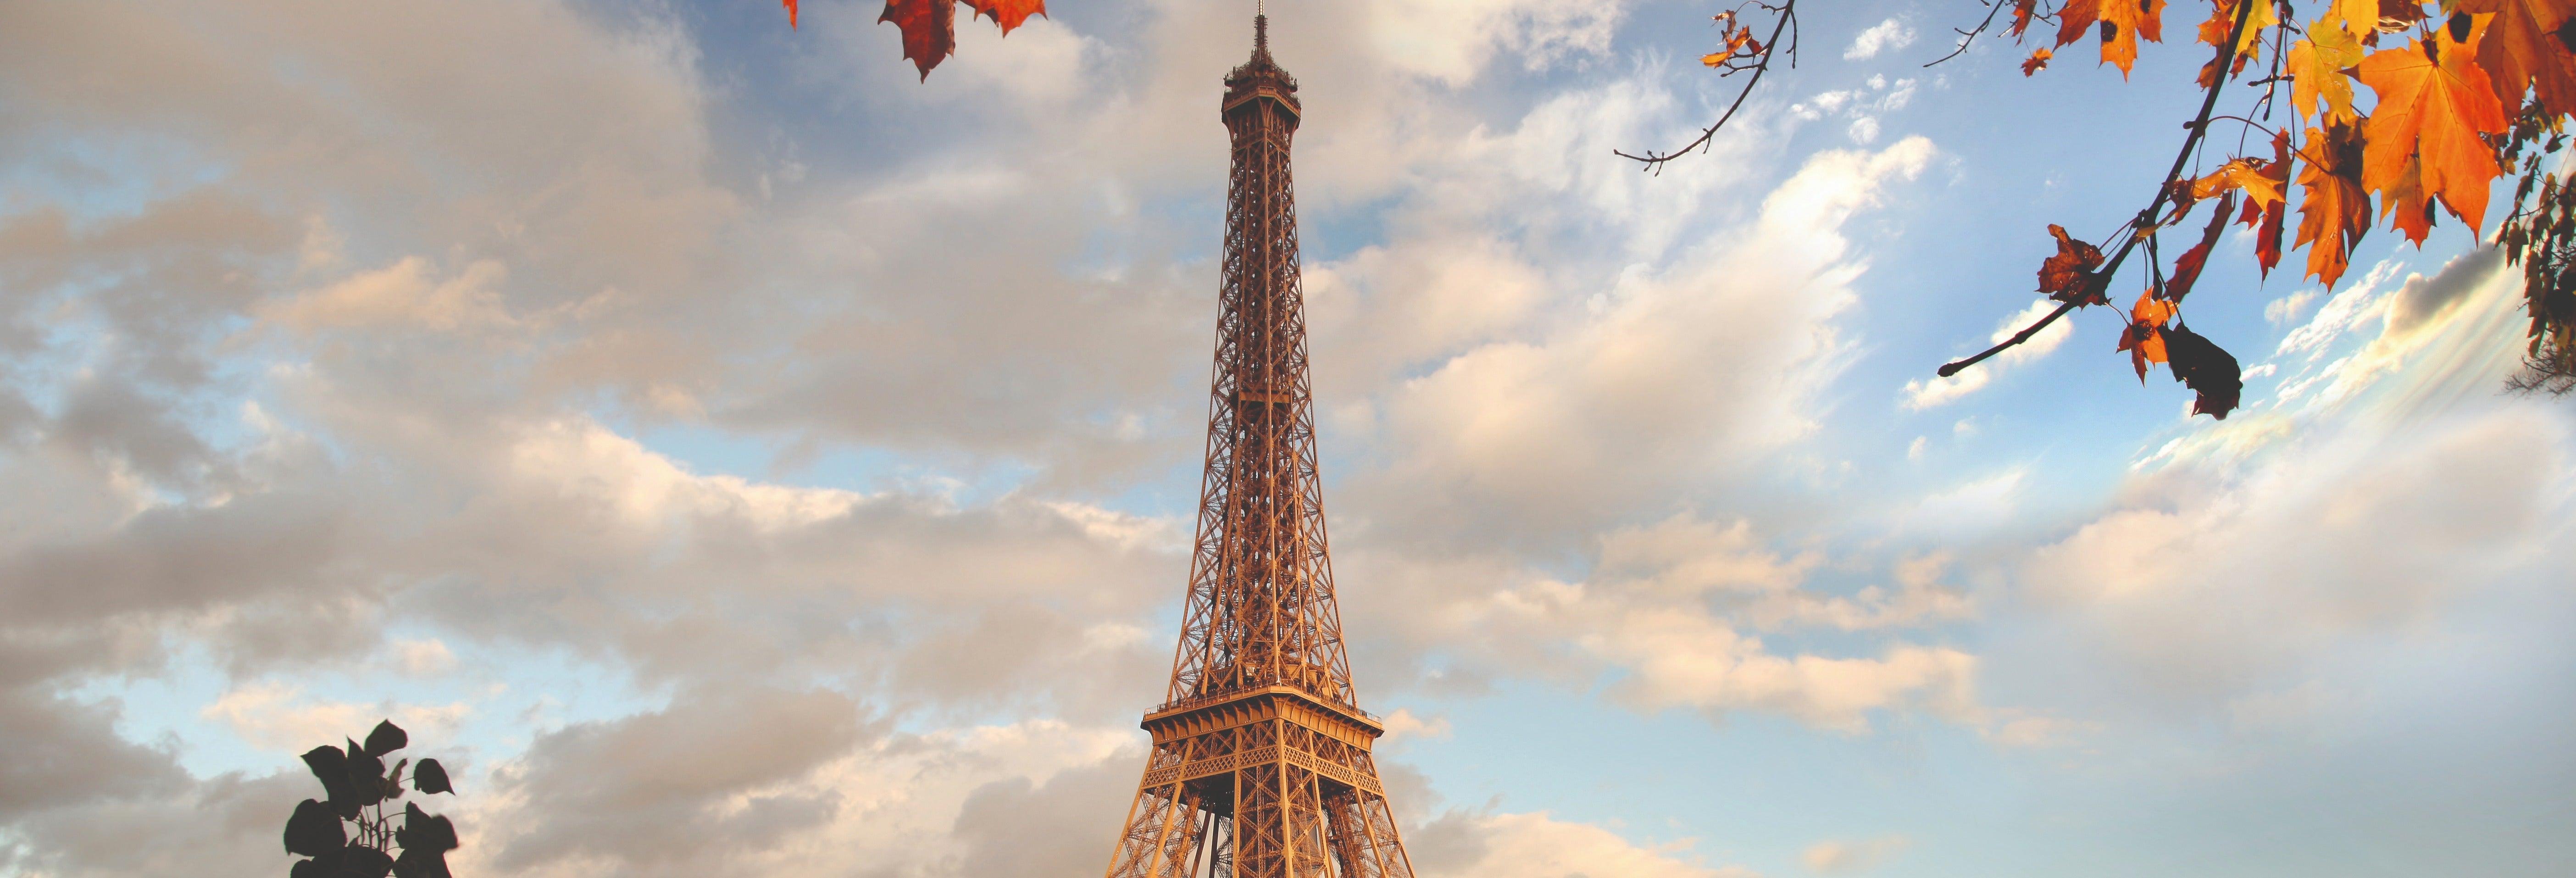 Tour por París, paseo en barco y Torre Eiffel